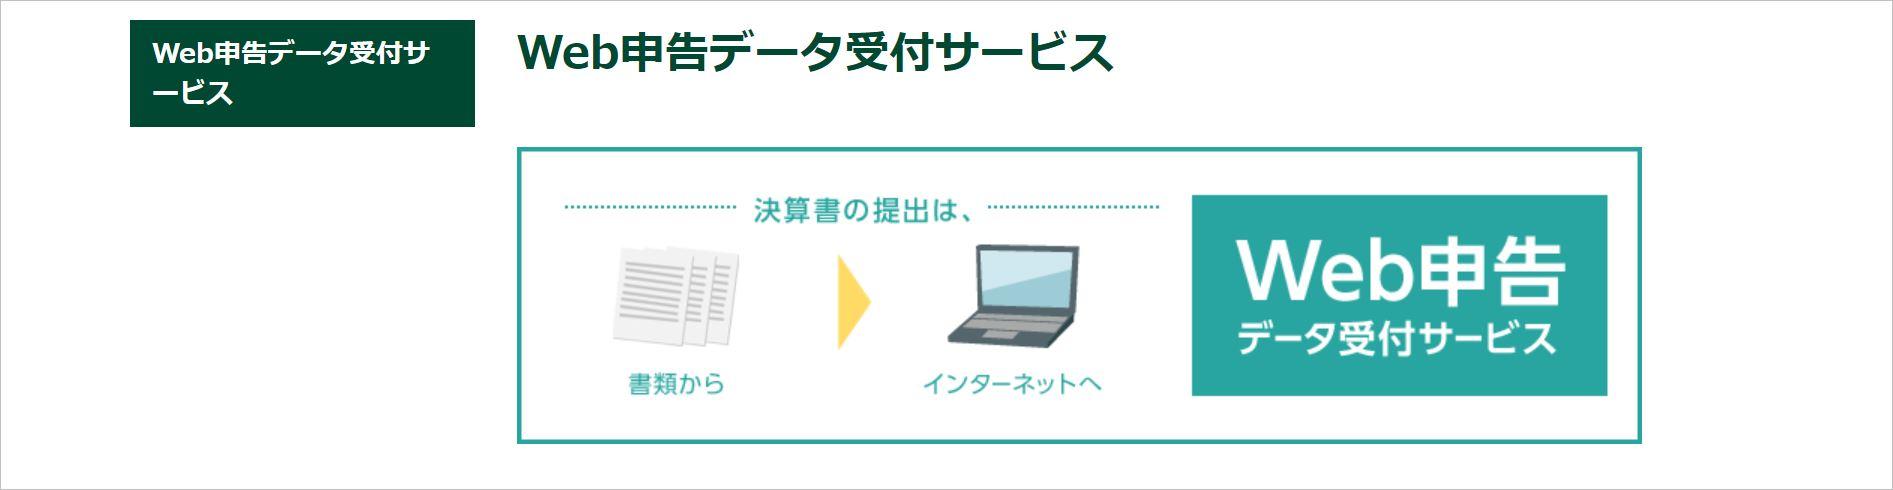 Web申告データ受付サービスの画面